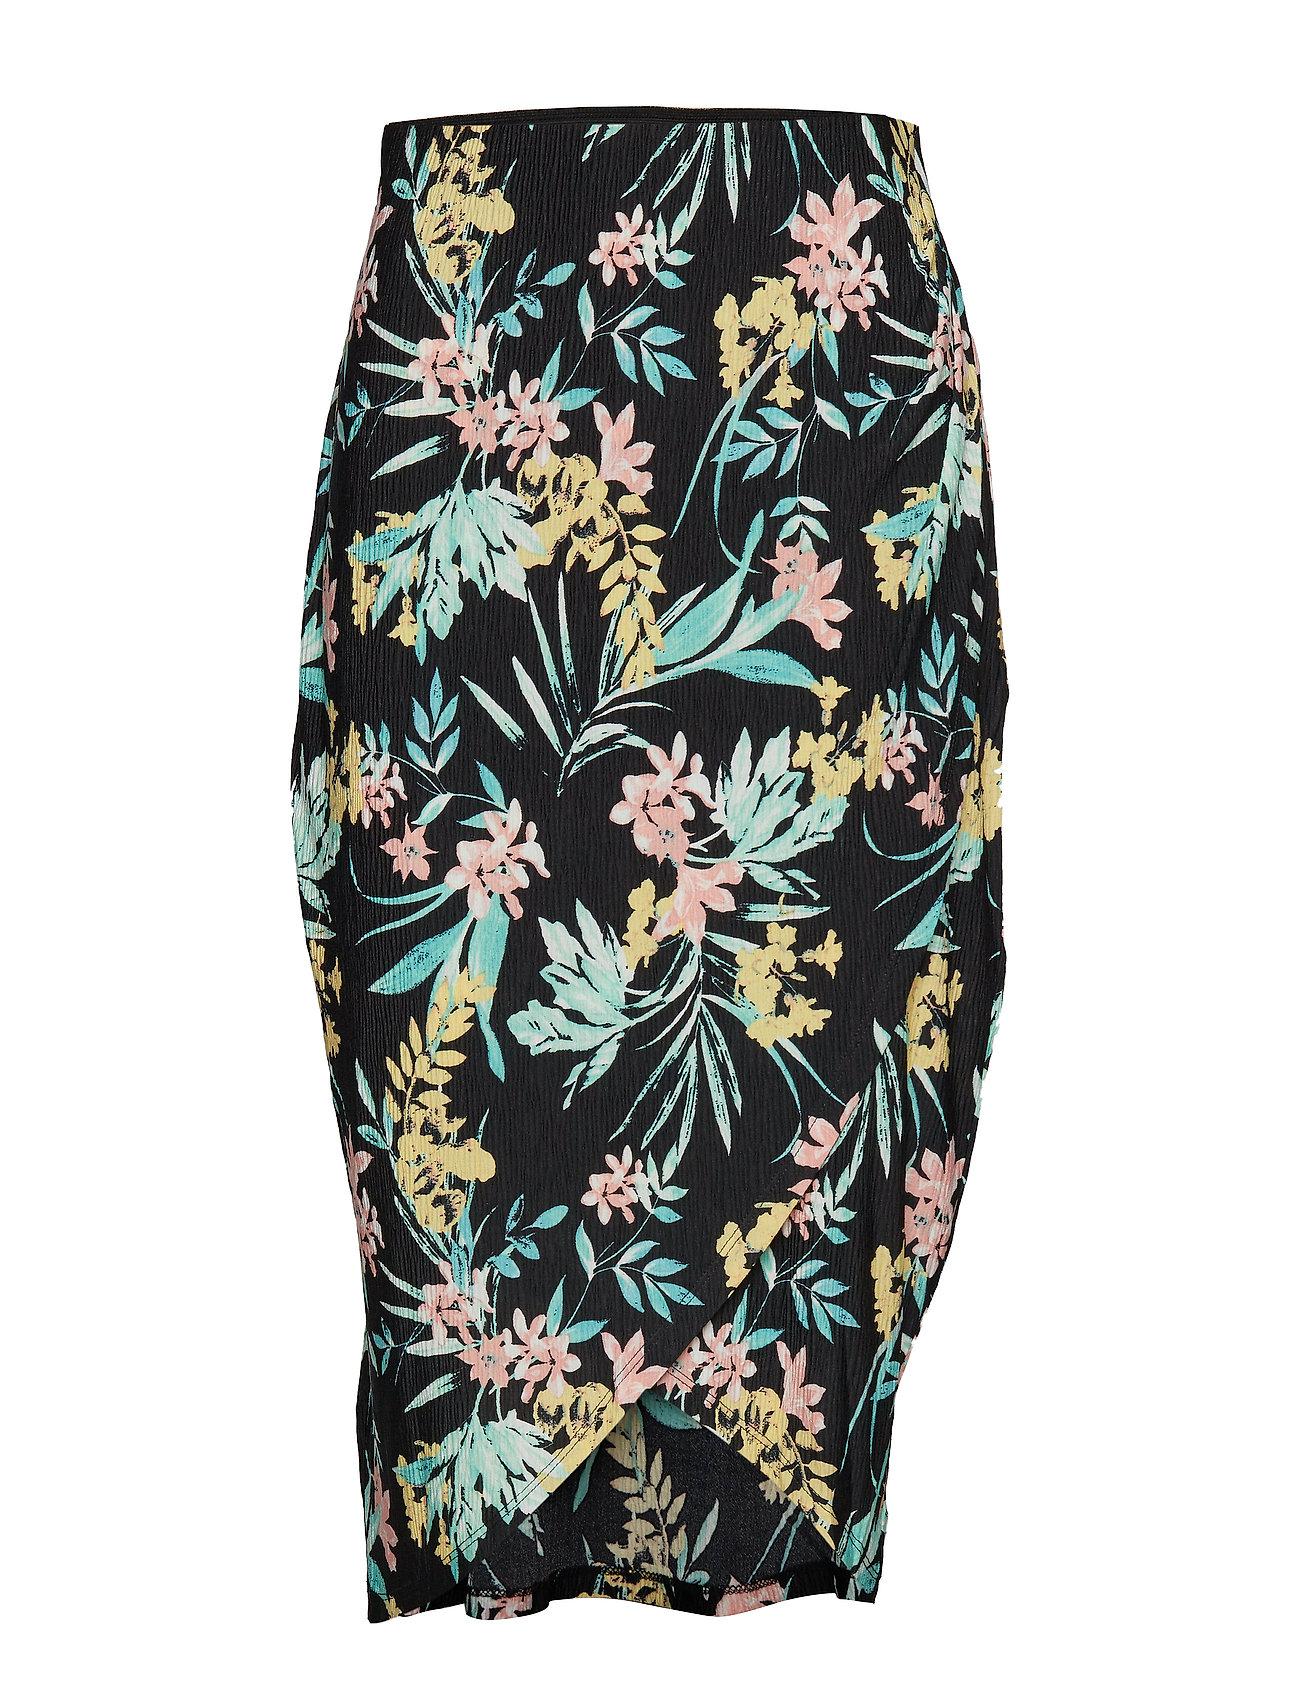 Gina Tricot Lovisa wrap skirt - VACAY TROPIC